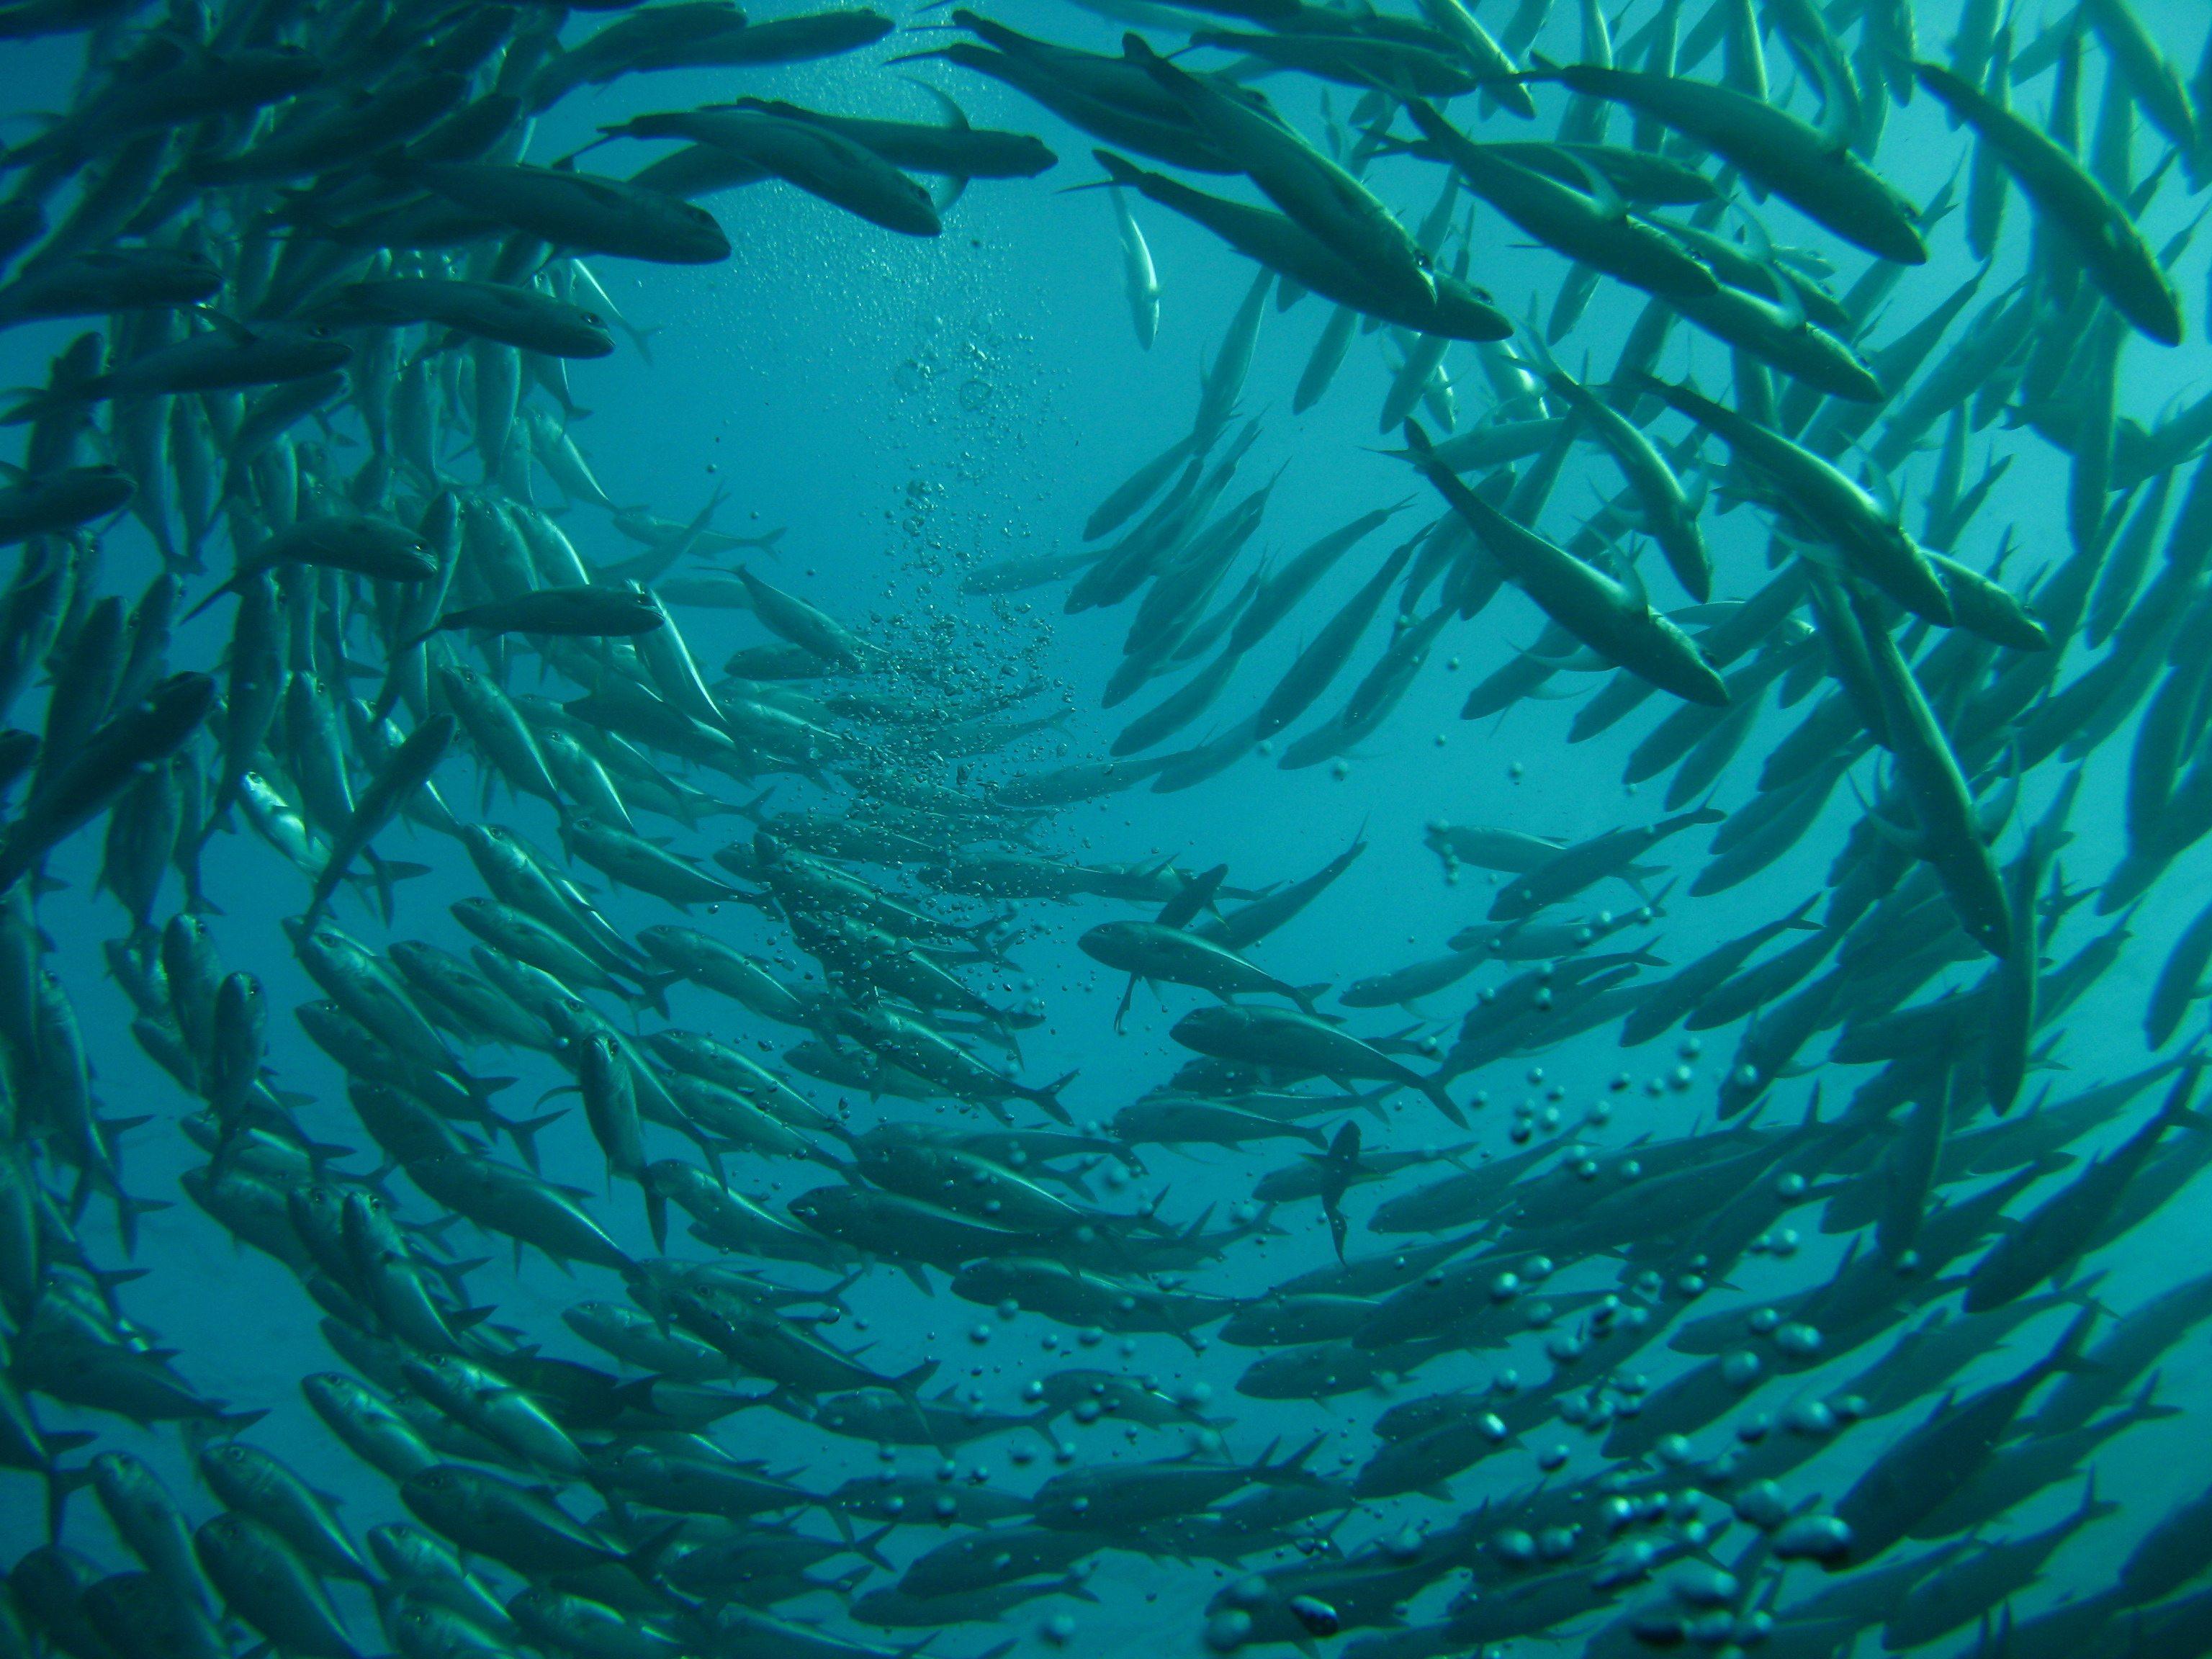 Mercury Pollution In Upper Ocean Has Tripled Since